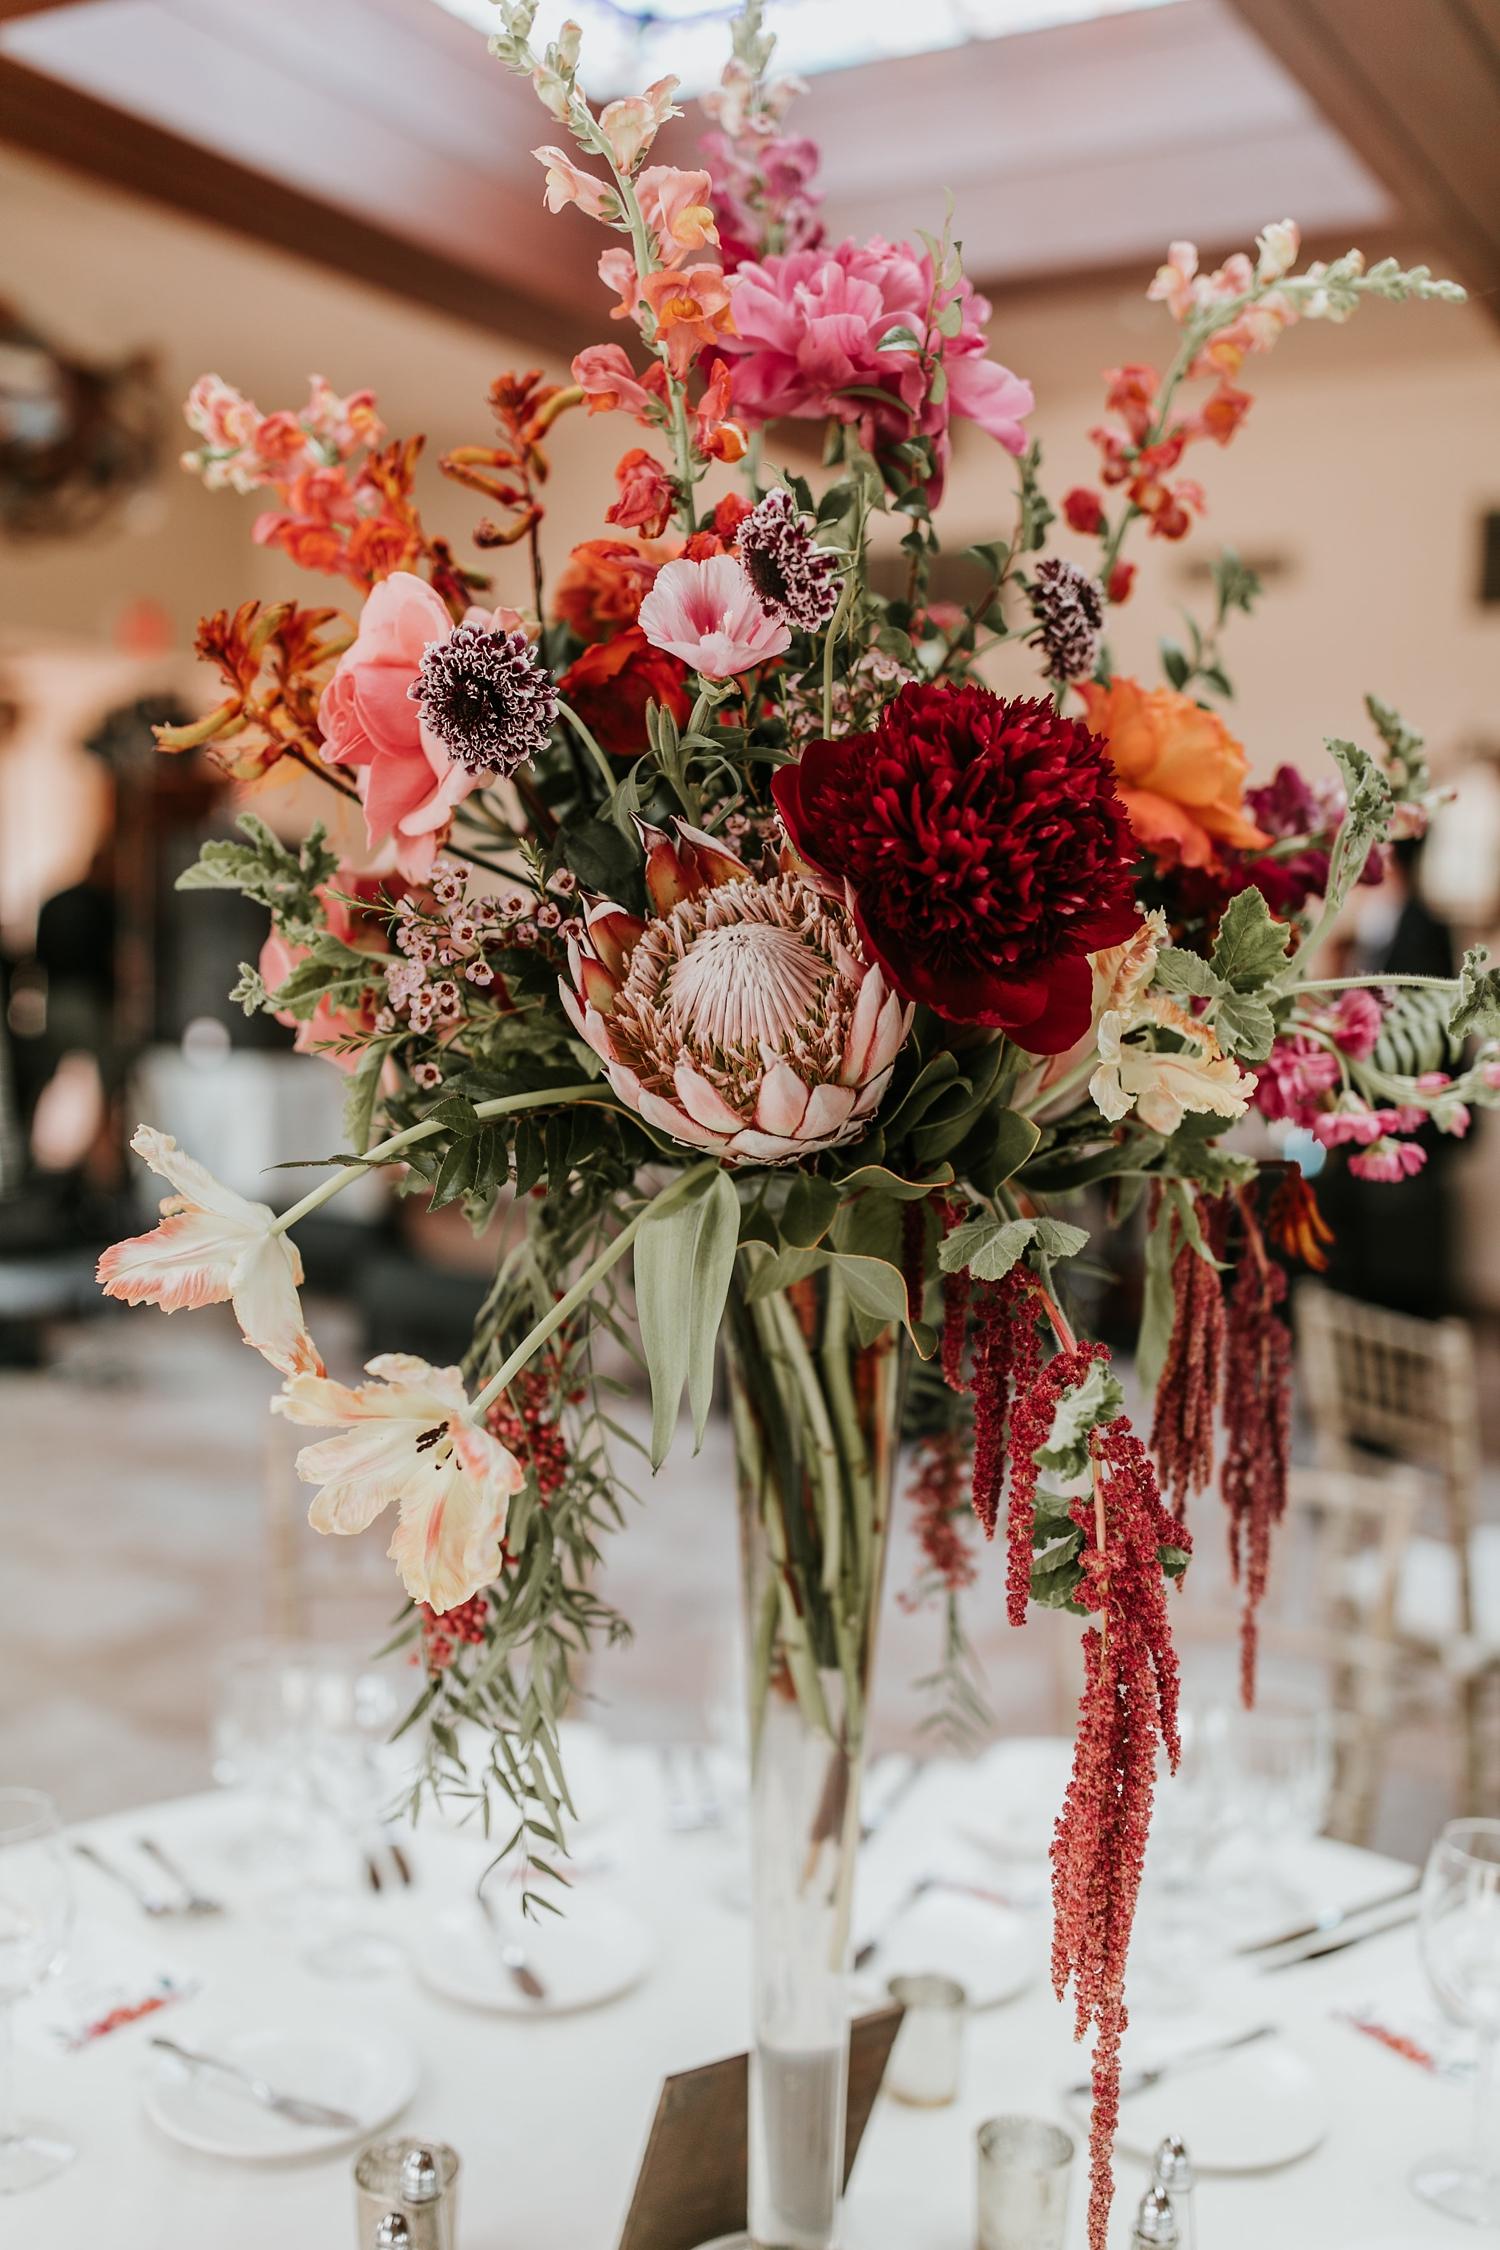 Alicia+lucia+photography+-+albuquerque+wedding+photographer+-+santa+fe+wedding+photography+-+new+mexico+wedding+photographer+-+wedding+flowers+-+summer+wedding+flowers_0030.jpg